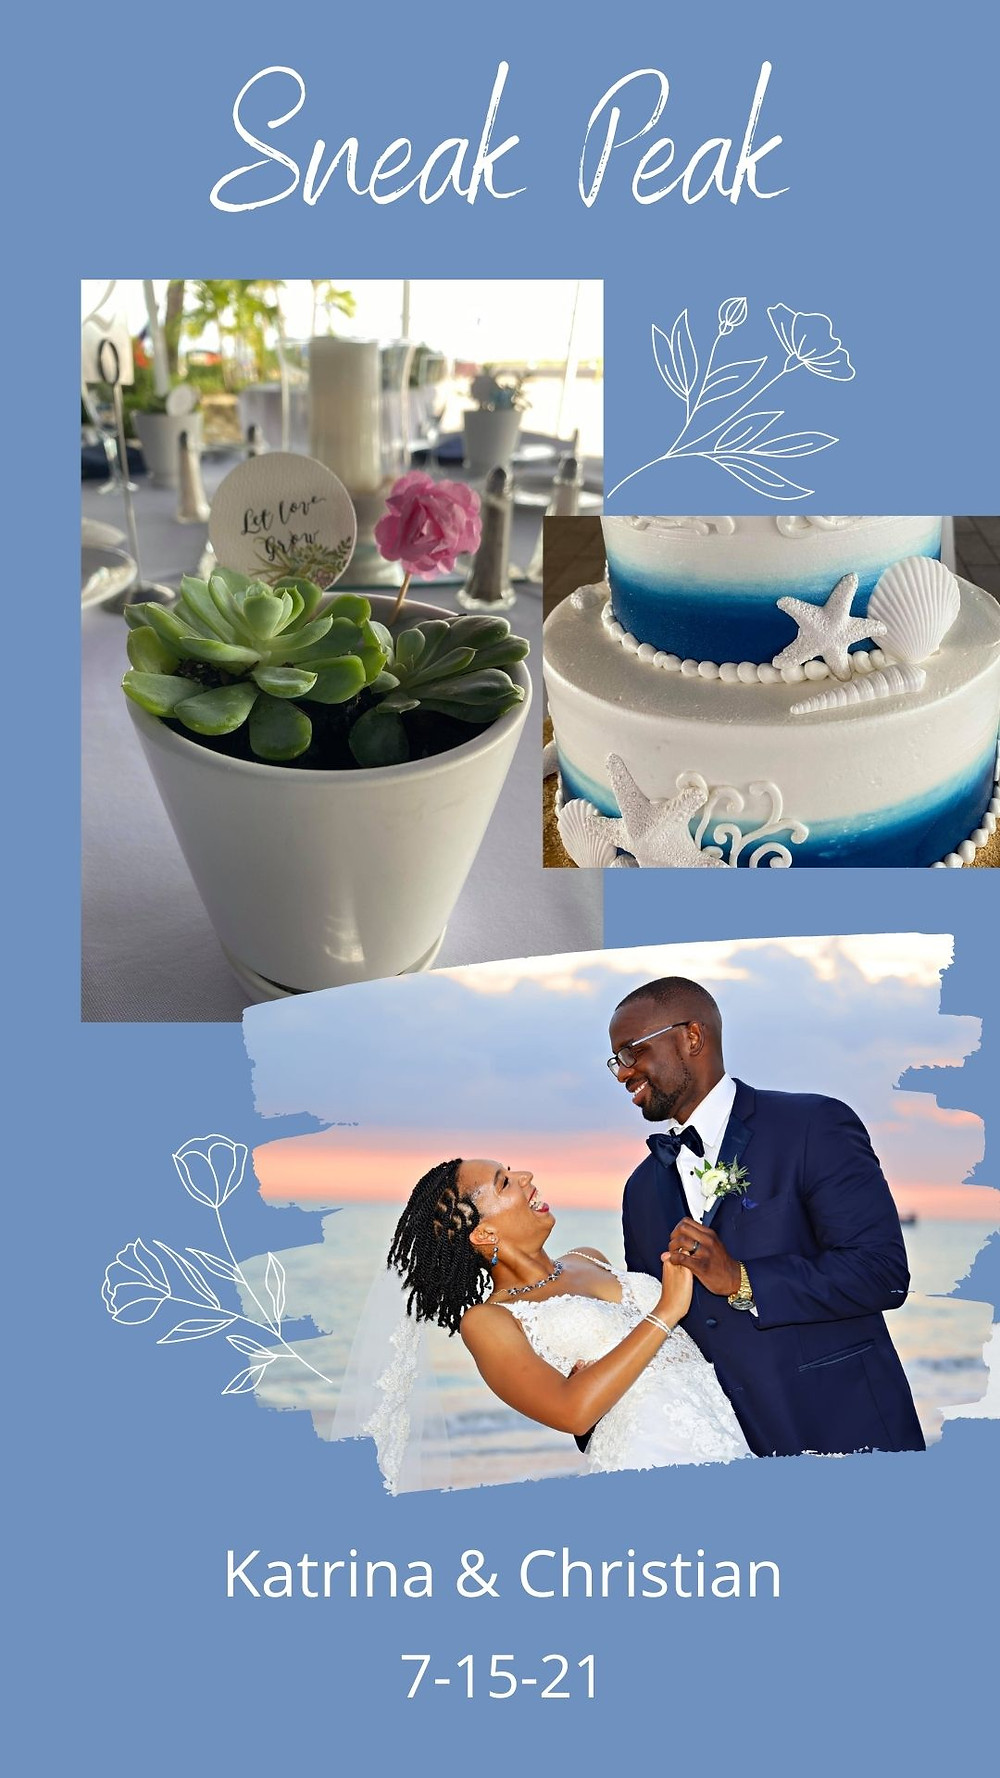 Wedding Laughter-Centerpieces-Cake